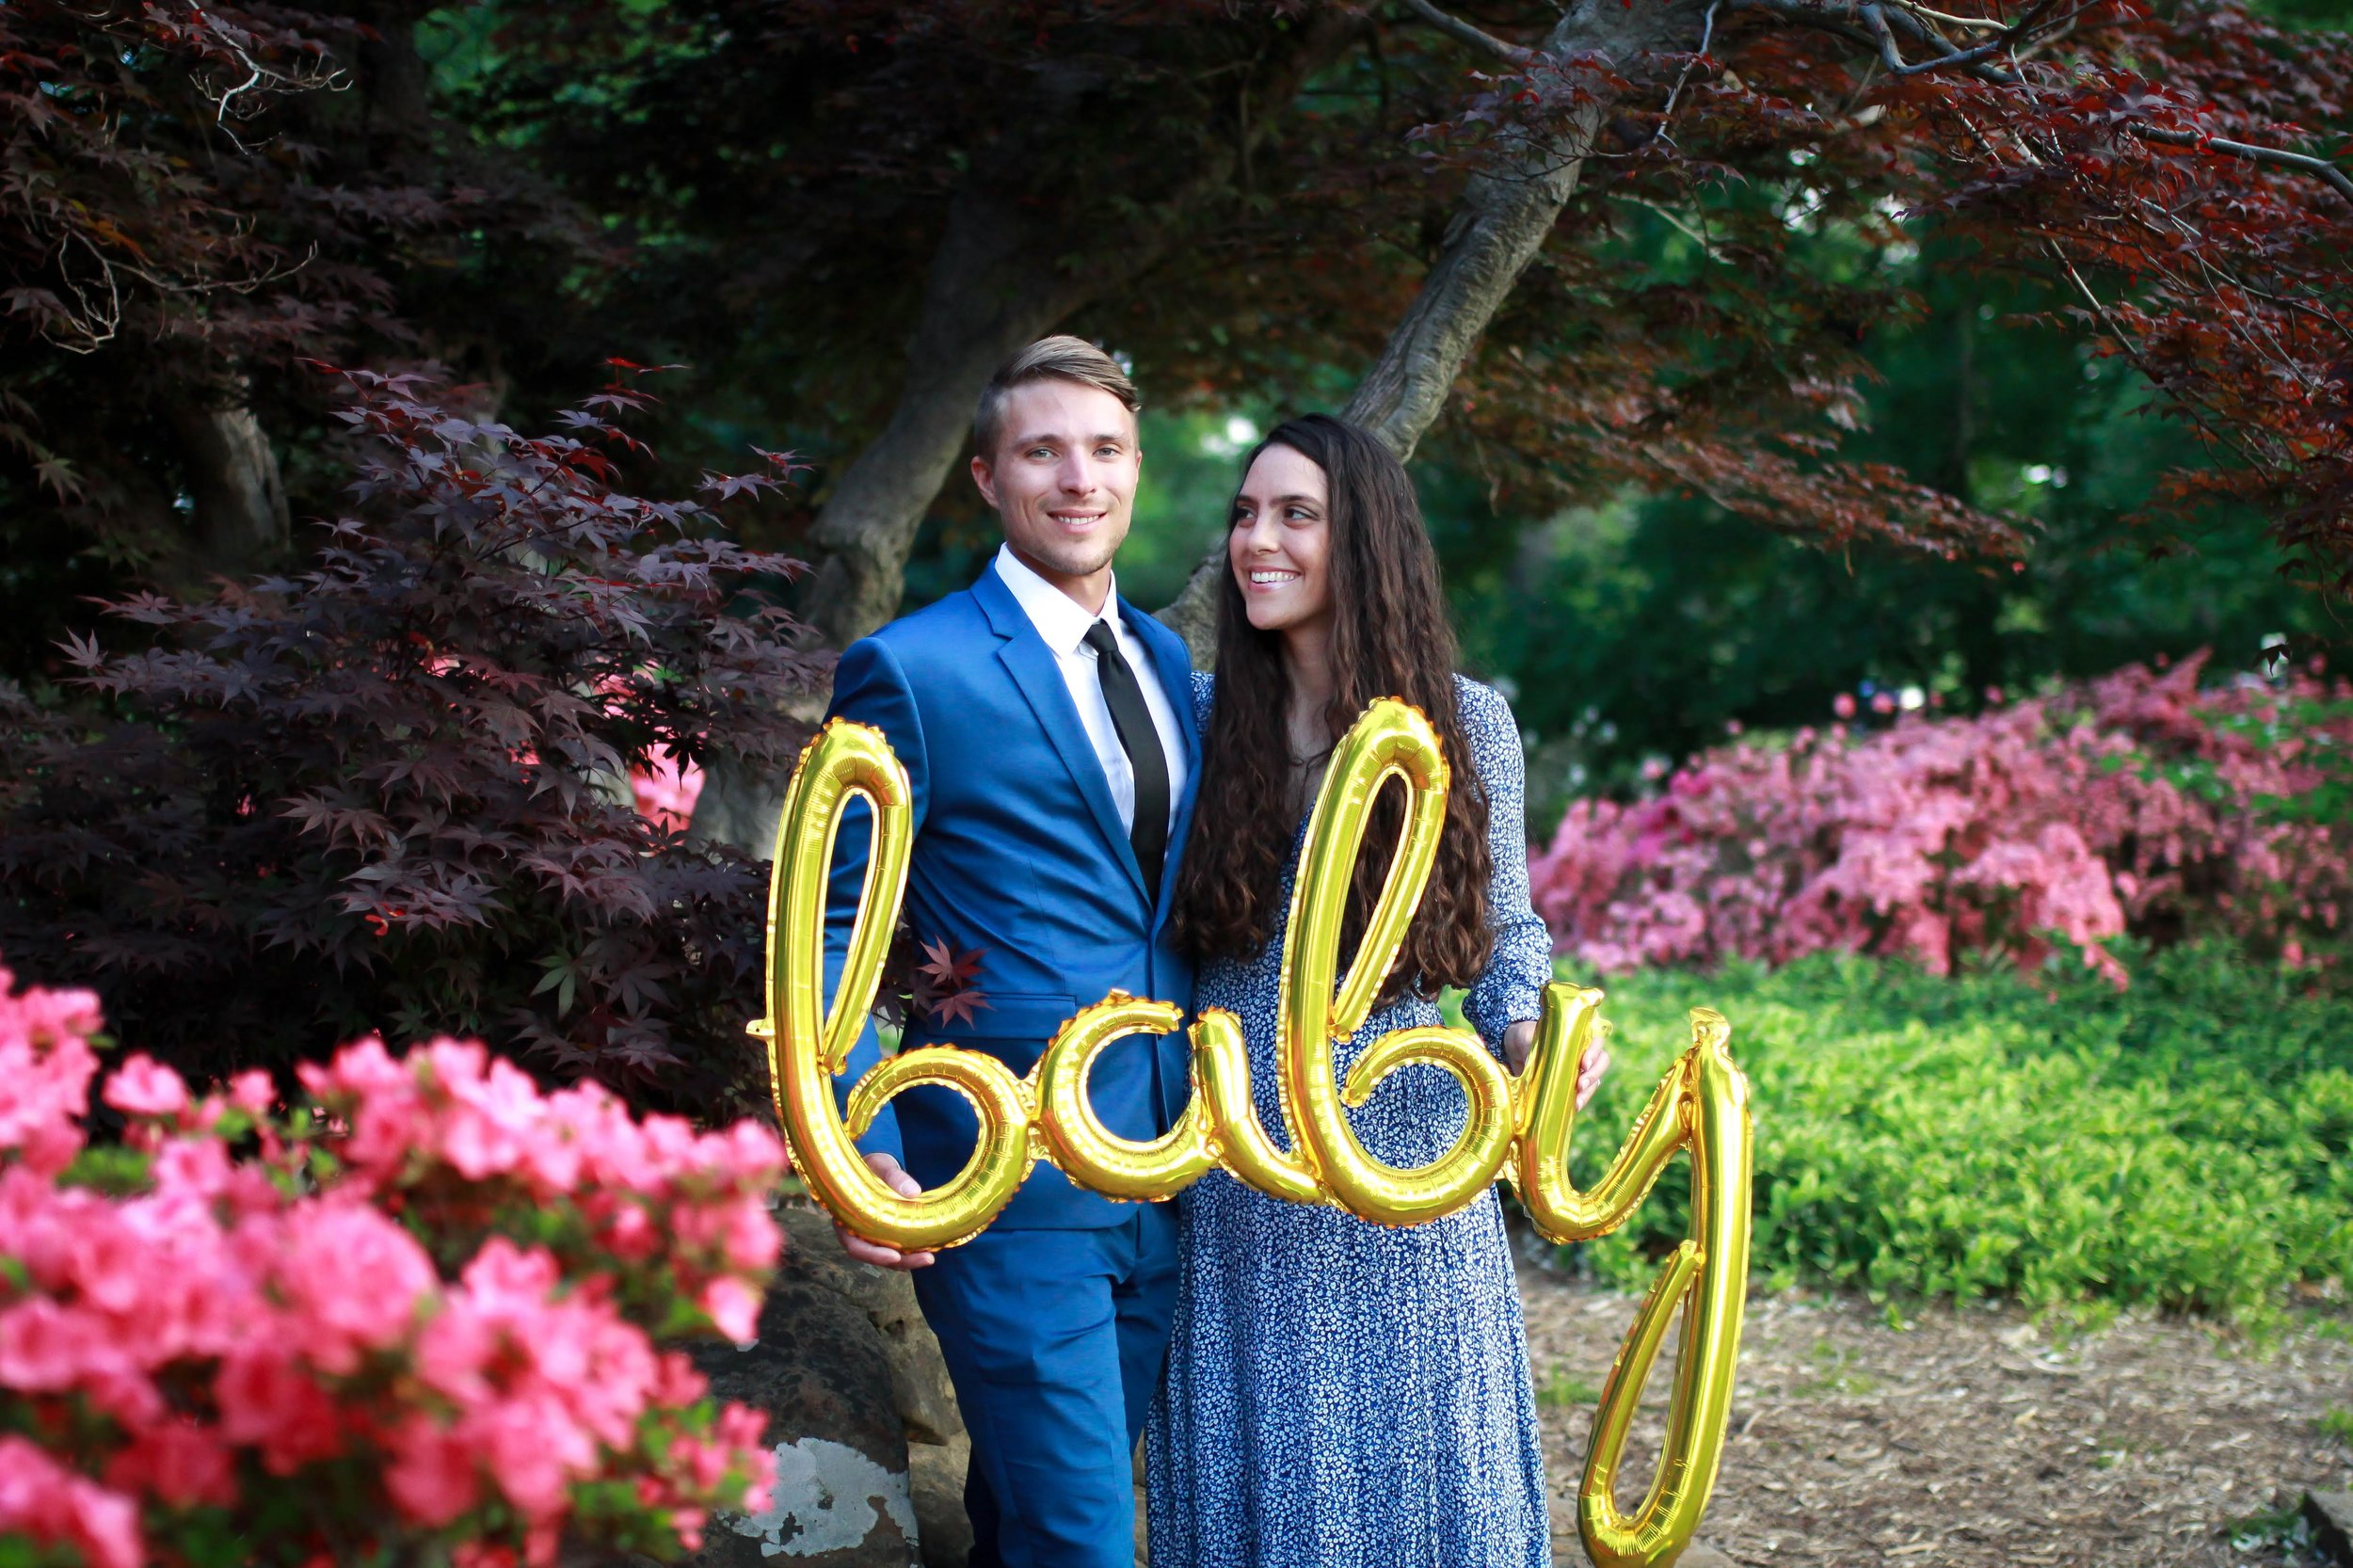 The Gavrilov's Rainbow Baby Announcement